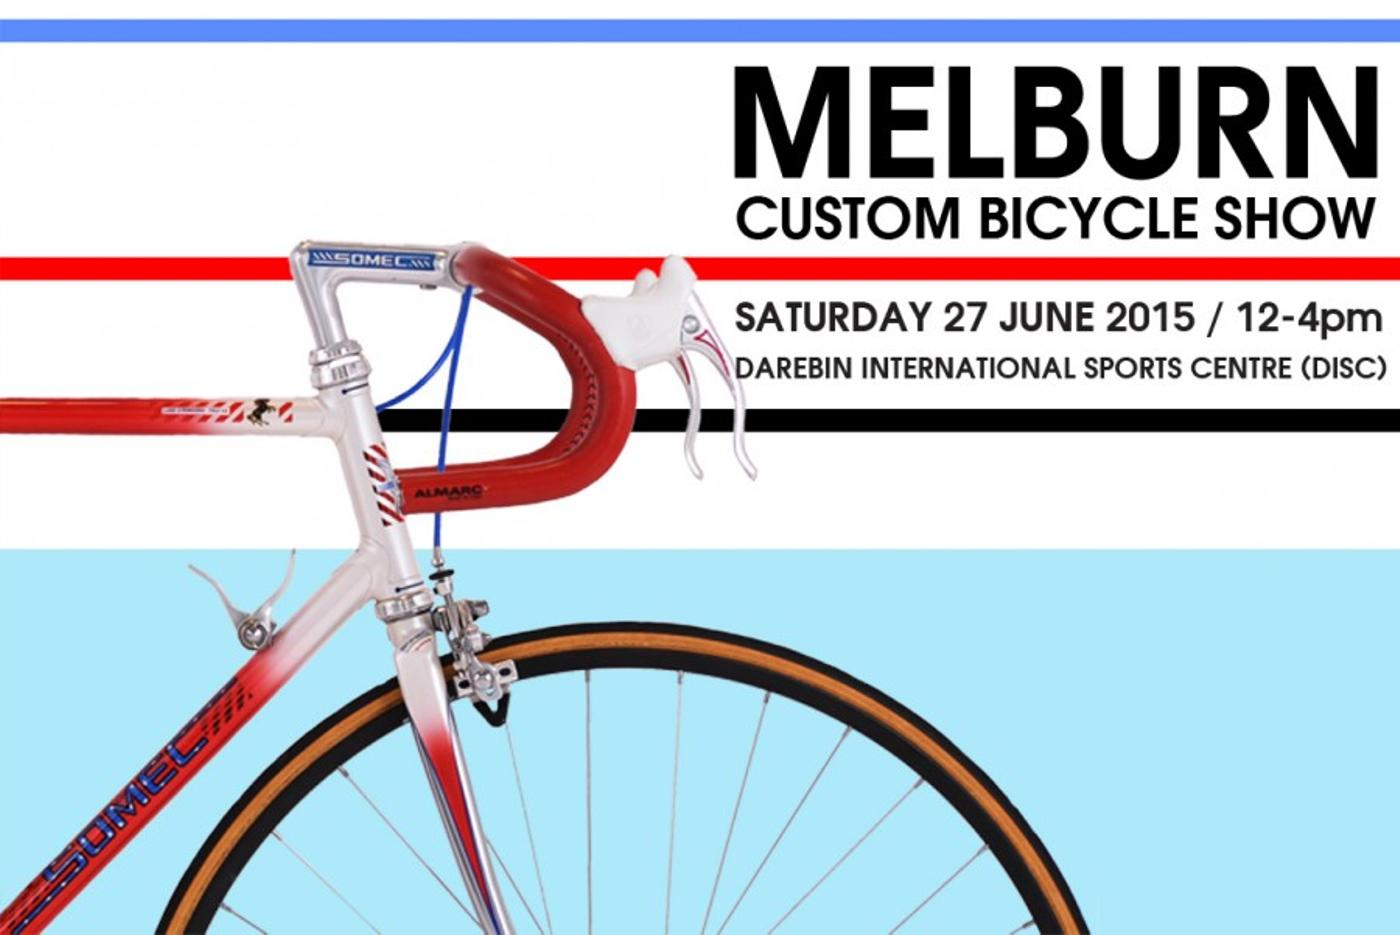 melburn-bike-show2-900x601